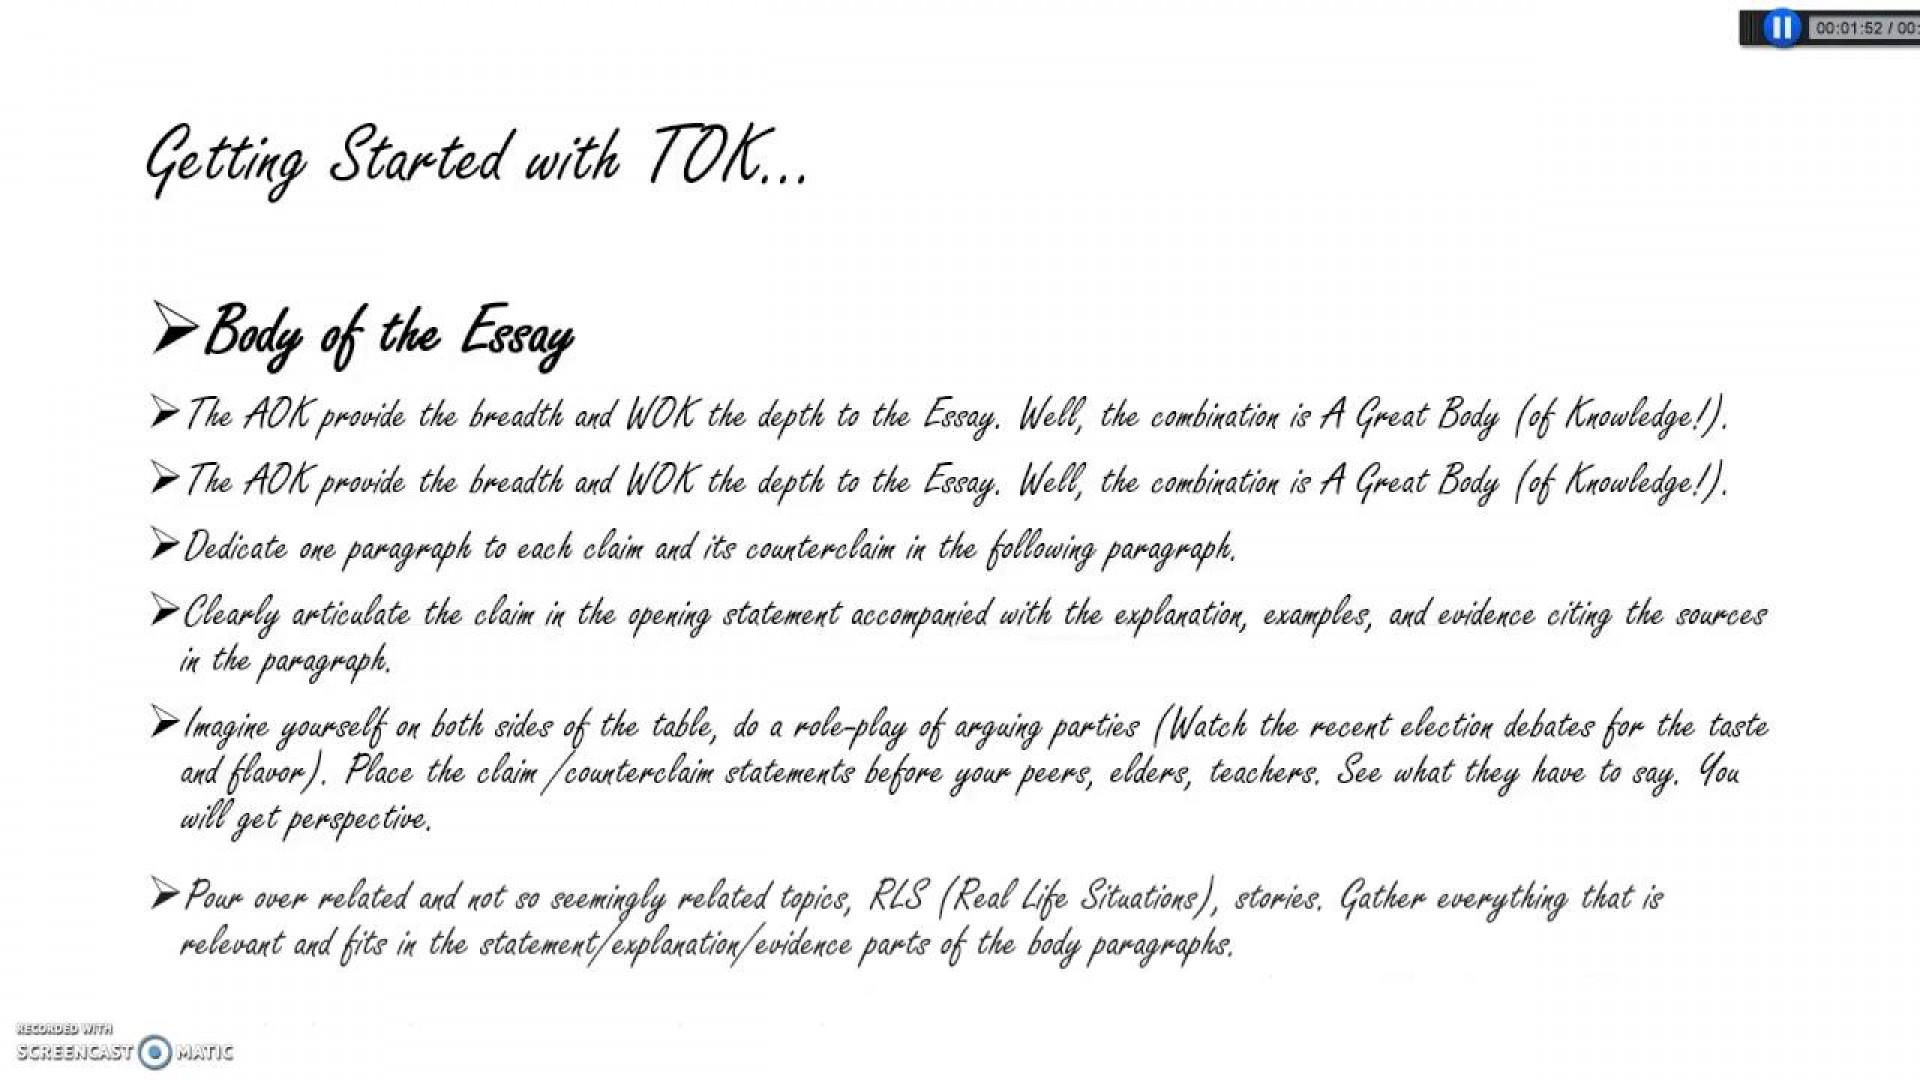 002 Essay Example Tok Sensational Examples To Avoid Rubric 2019 Titles Ideas 1920